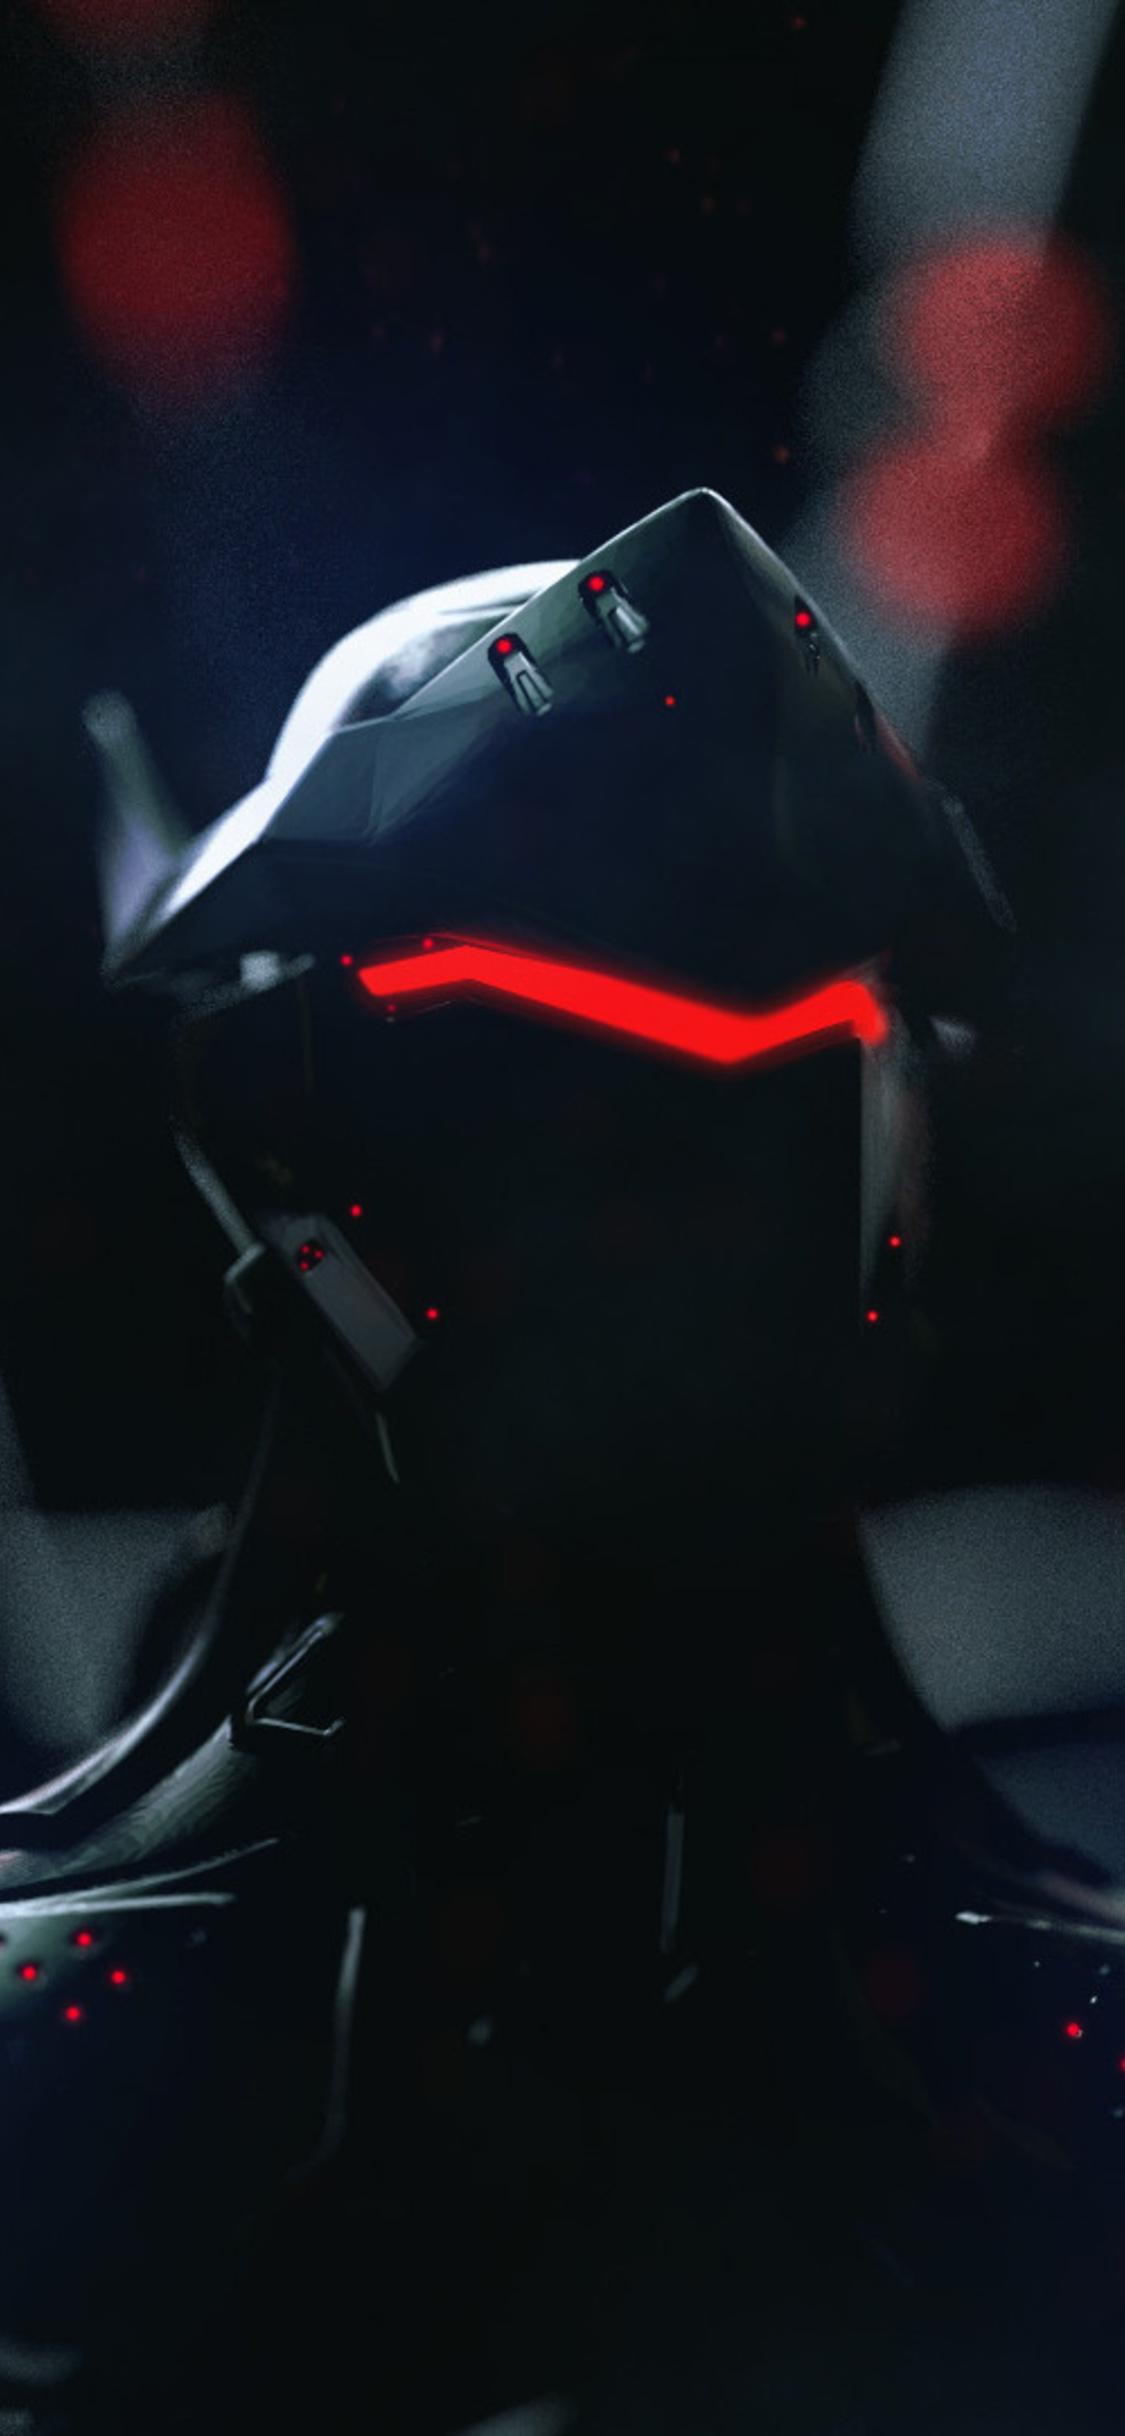 1125x2436 Genji Overwatch Neon Artwork Iphone Xs Iphone 10